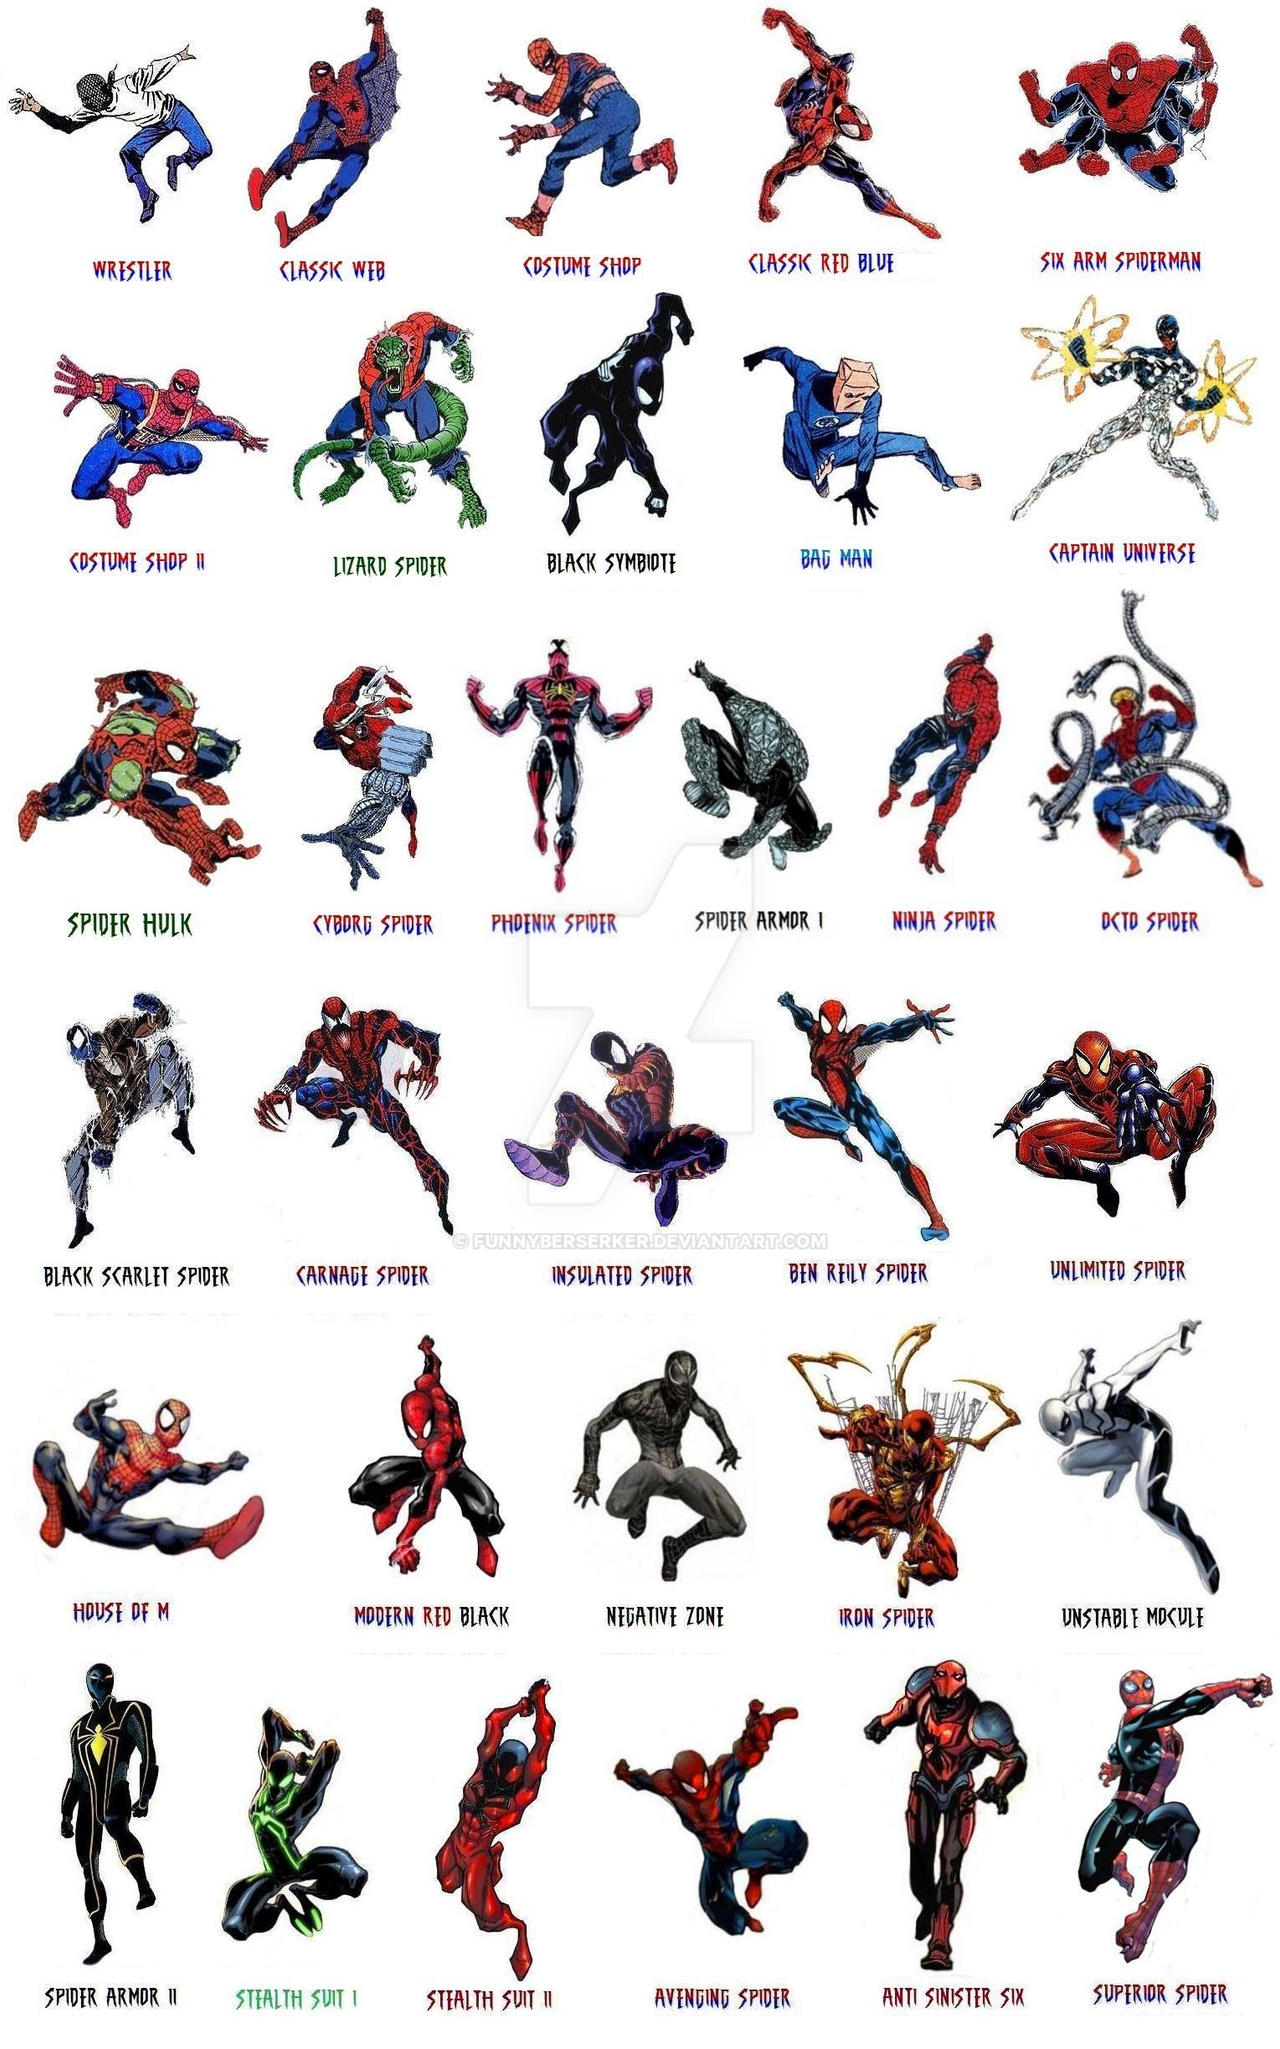 ... funnyberserker Spiderman Costume changes over years (Earth616) by funnyberserker  sc 1 st  DeviantArt & Spiderman Costume changes over years (Earth616) by funnyberserker on ...